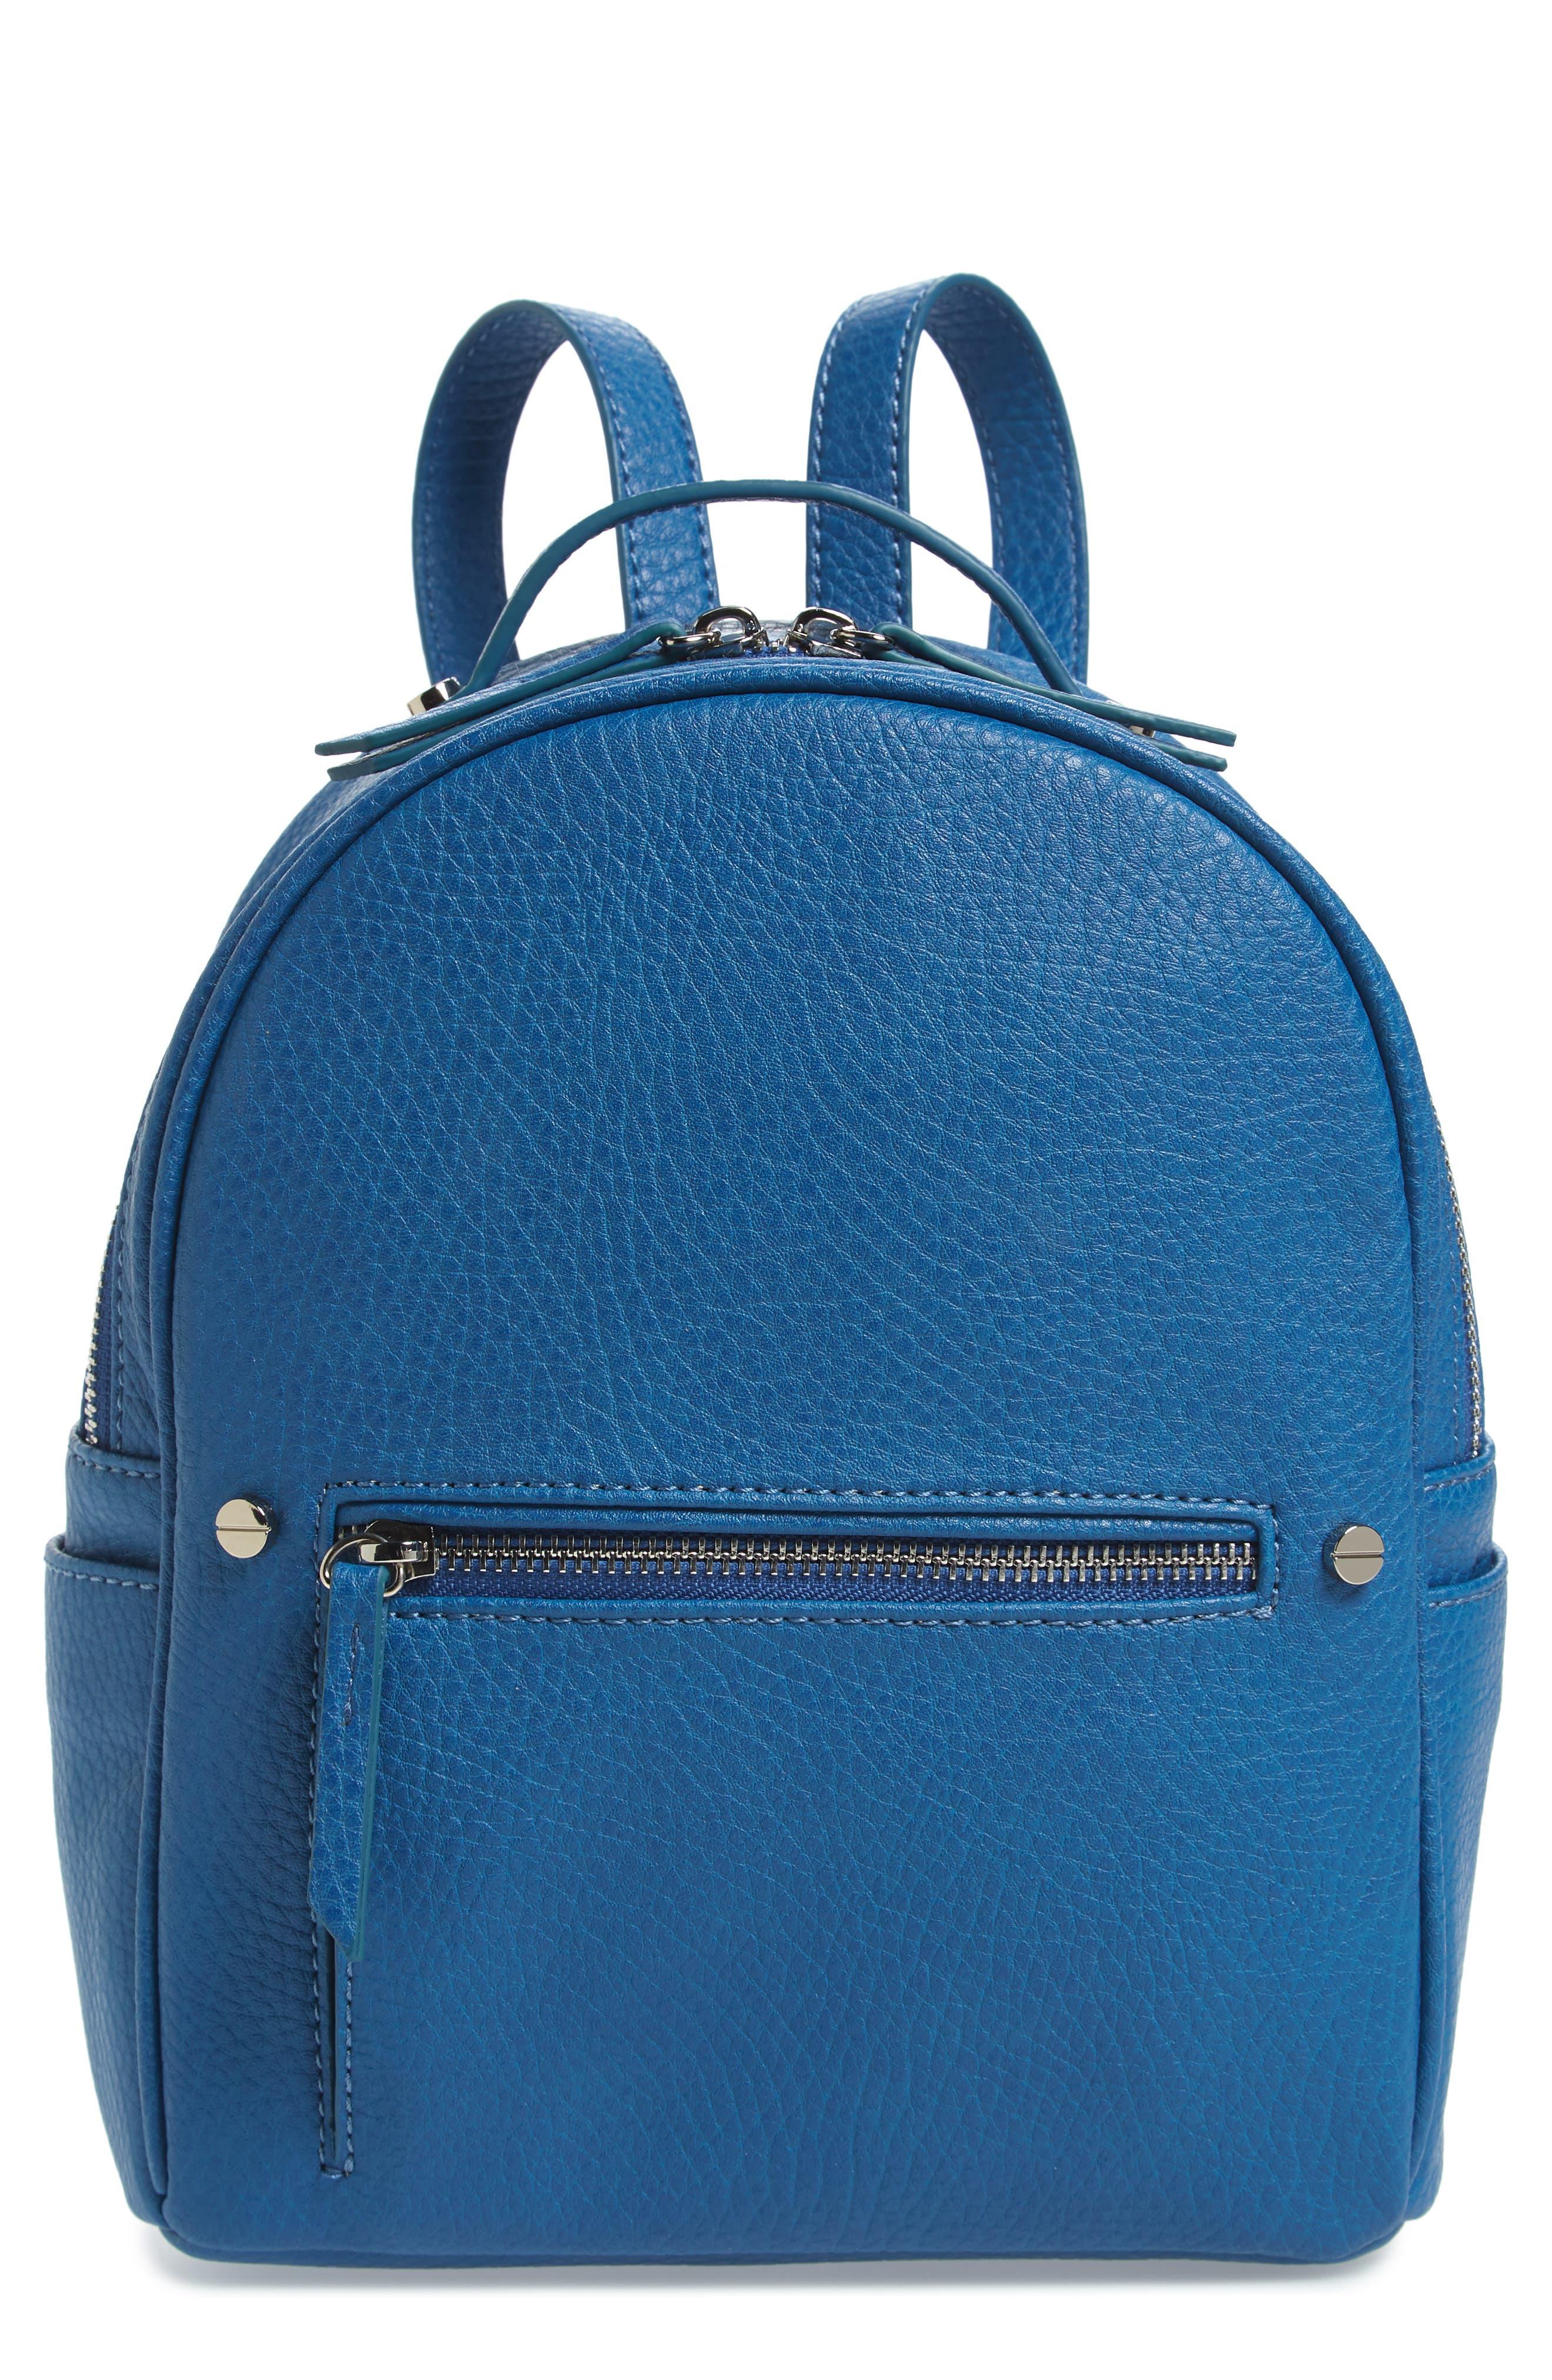 Mali + Lili Hannah Vegan Leather Backpack,                             Main thumbnail 1, color,                             FRENCH BLUE